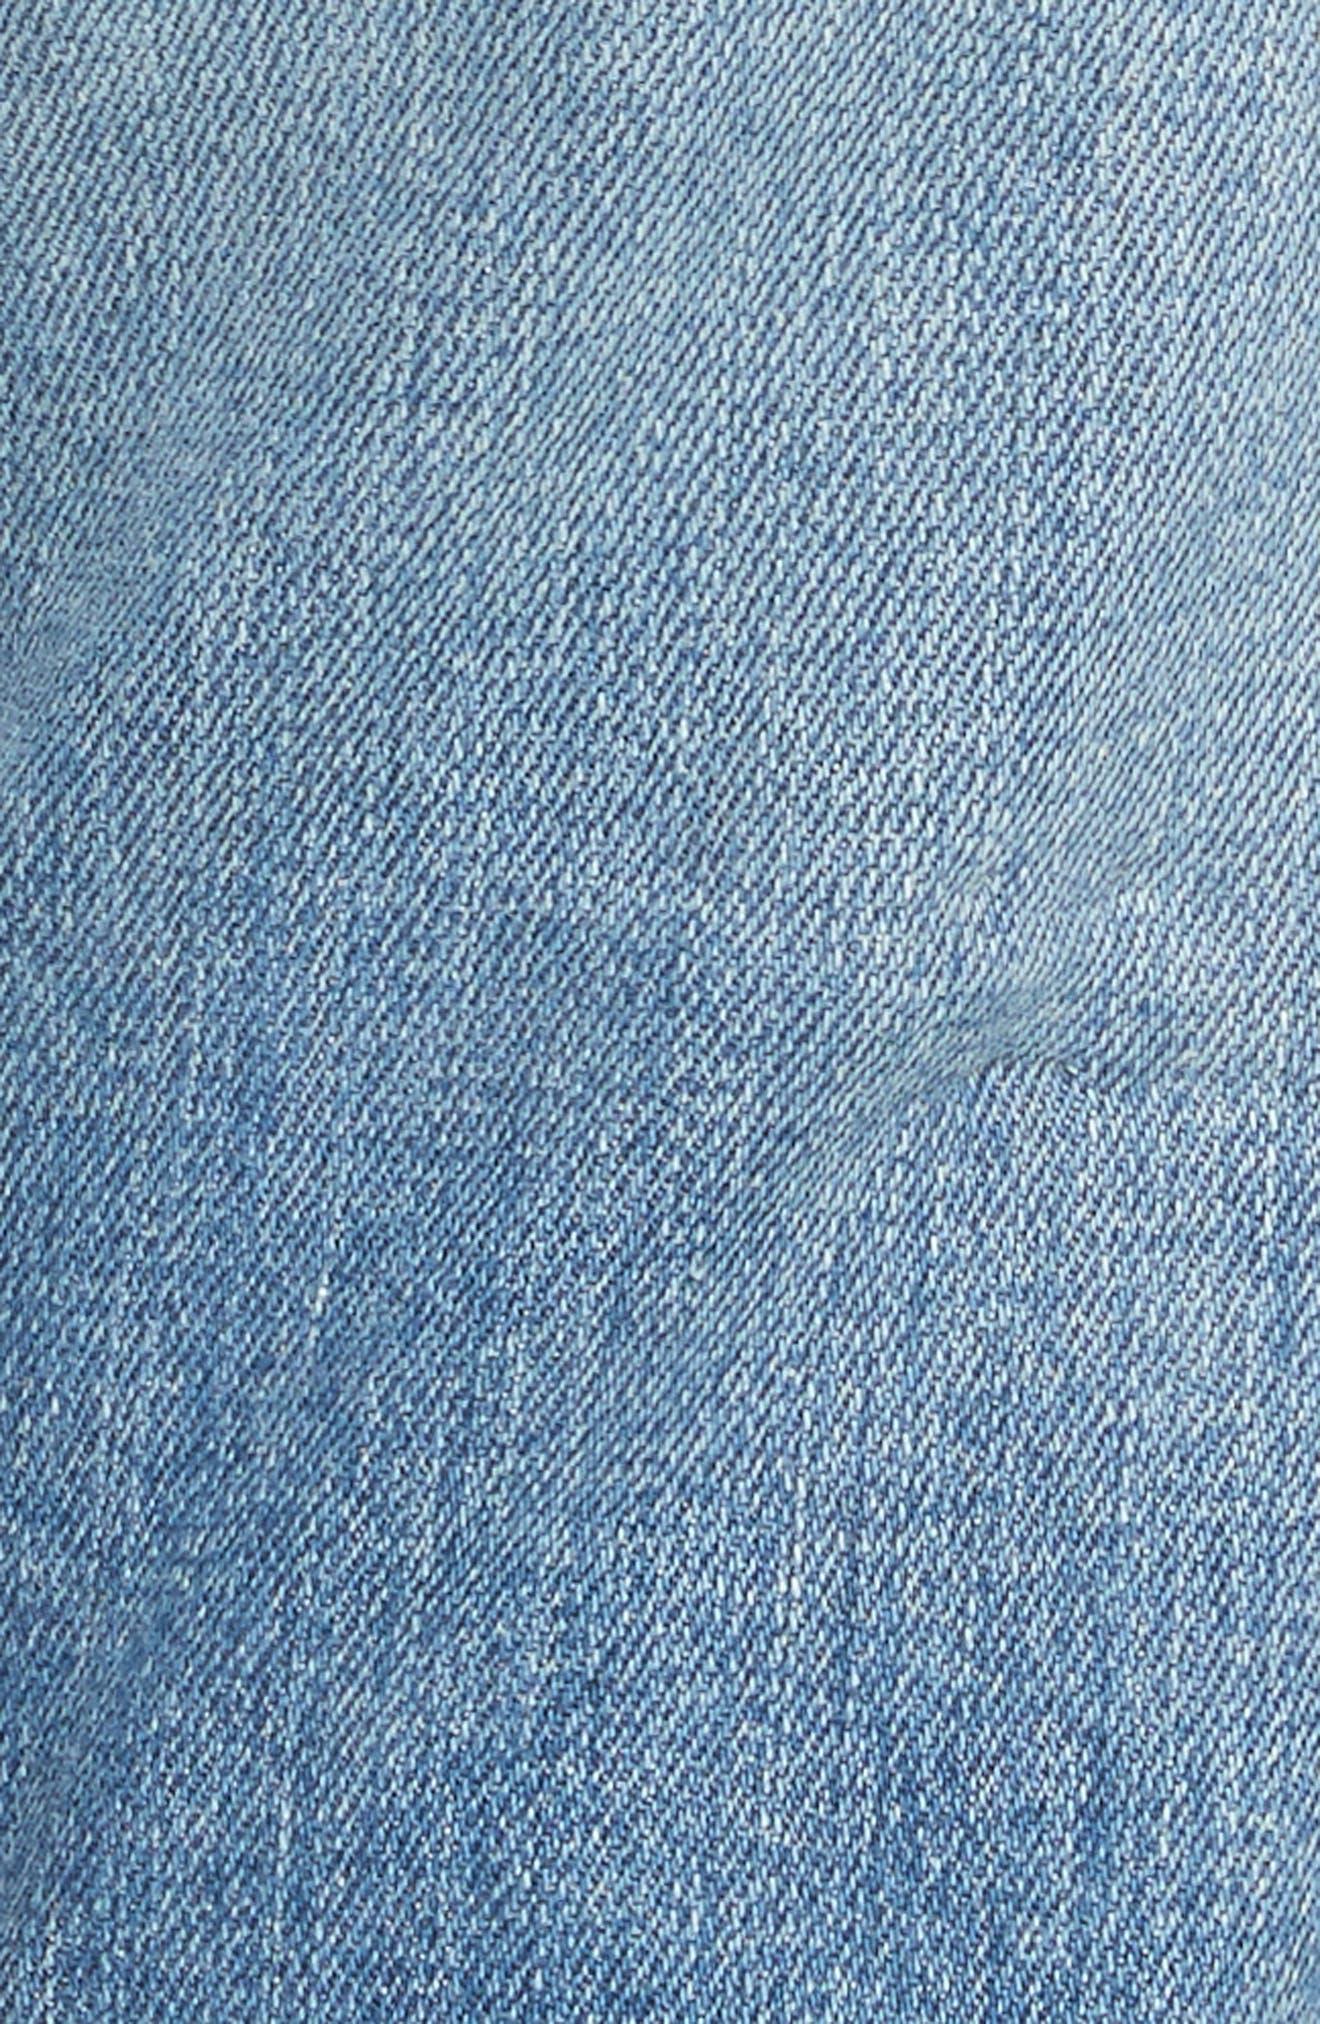 PSWL Straight Leg Jeans,                             Alternate thumbnail 5, color,                             428